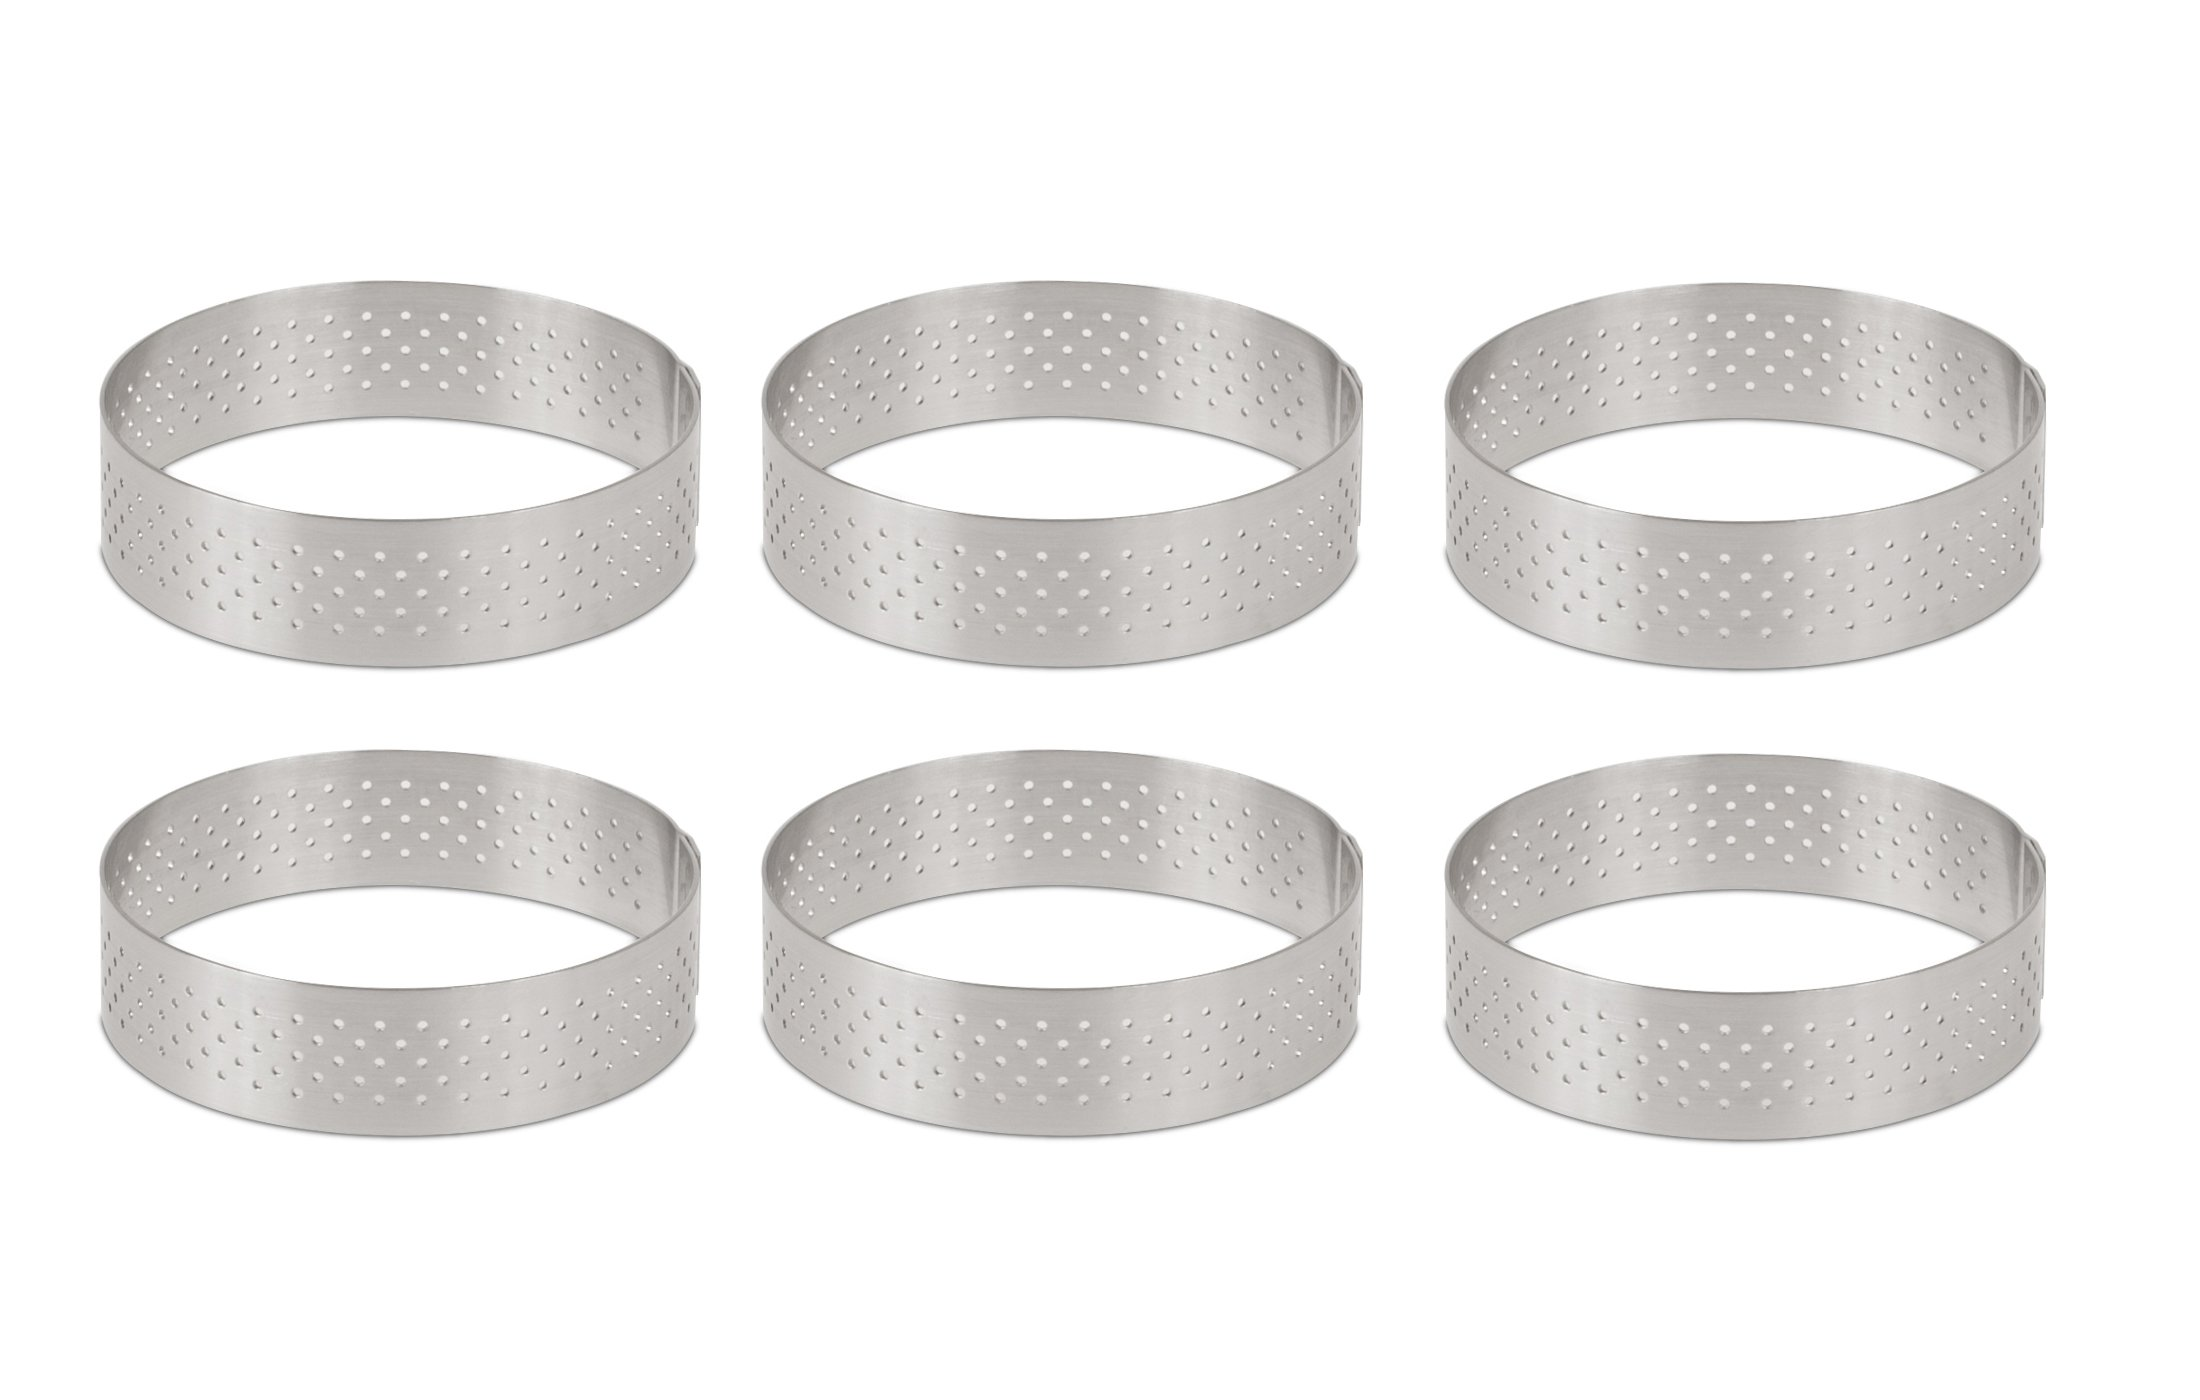 DeBuyer Valrhona Perforated Tart Ring - 3.5 inch Diameter, Set of 6 units by De Buyer